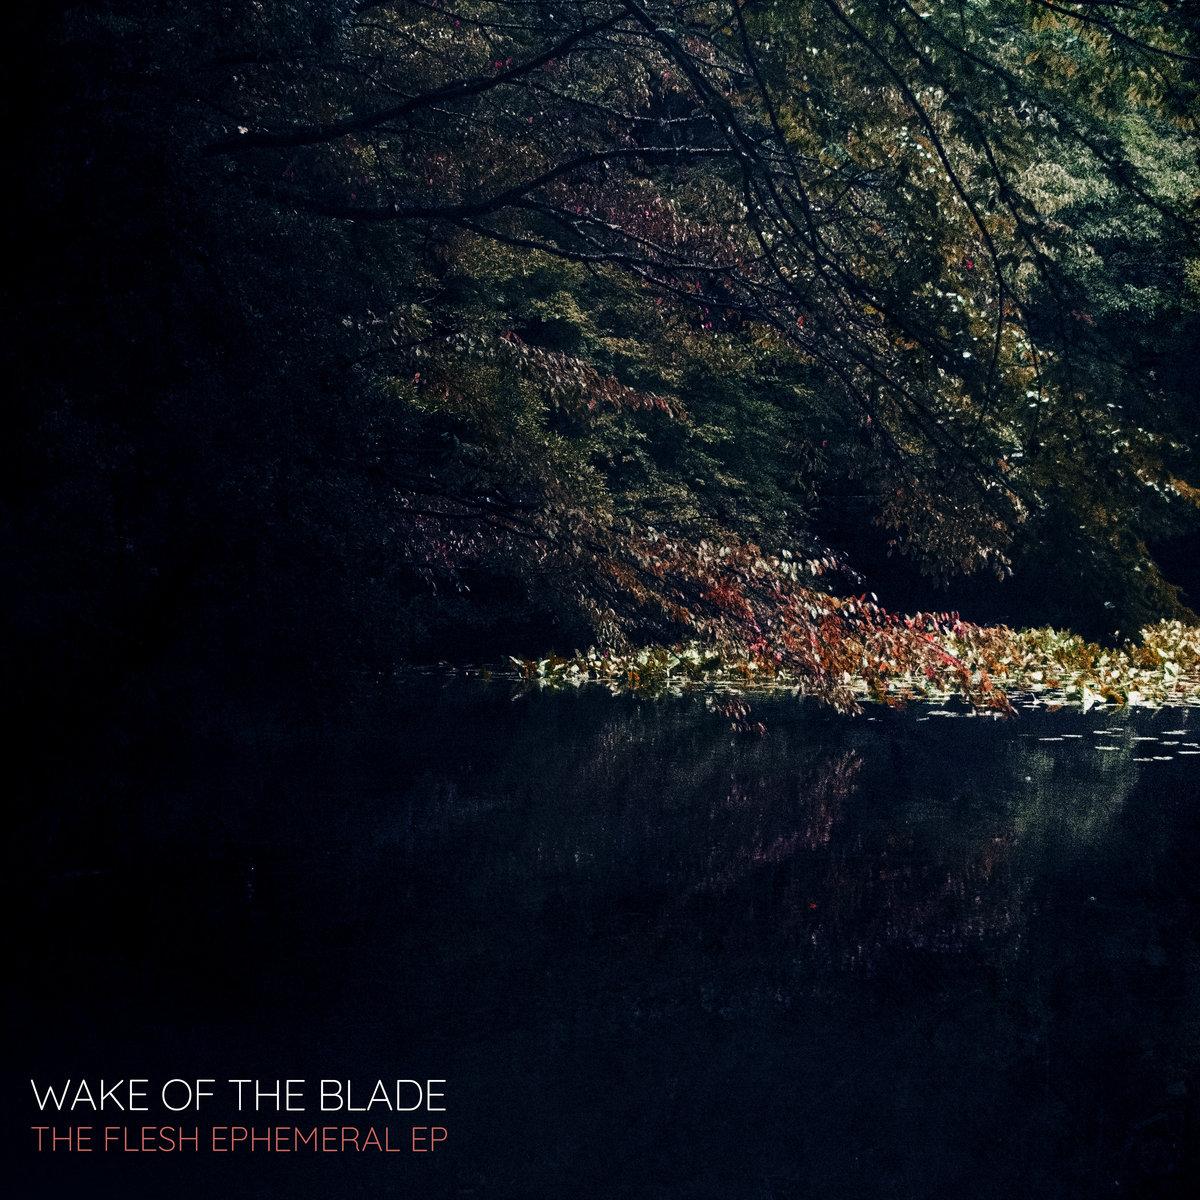 https://wakeoftheblade.bandcamp.com/releases